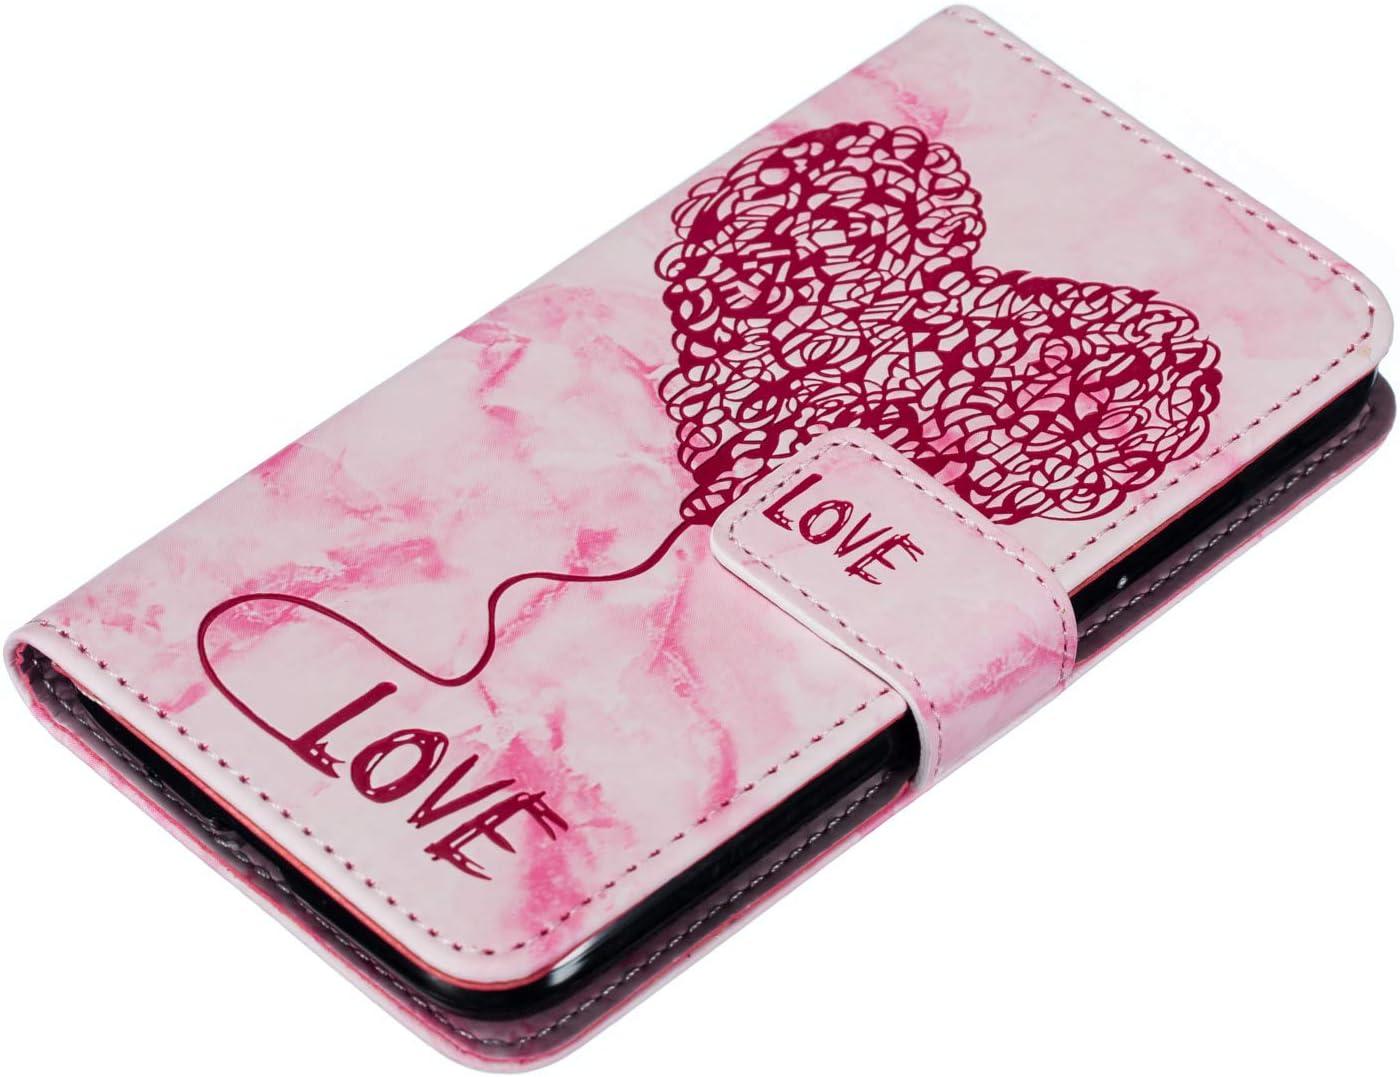 Kompatibel mit Handy H/ülle Huawei Y3 2017 Lederh/ülle Marmor Liebe Herz Muster Flip Case Cover Bunt Brieftasche Klapph/ülle Ledertasche D/ünn Tasche Handytasche Handy Schutzh/ülle,Blau